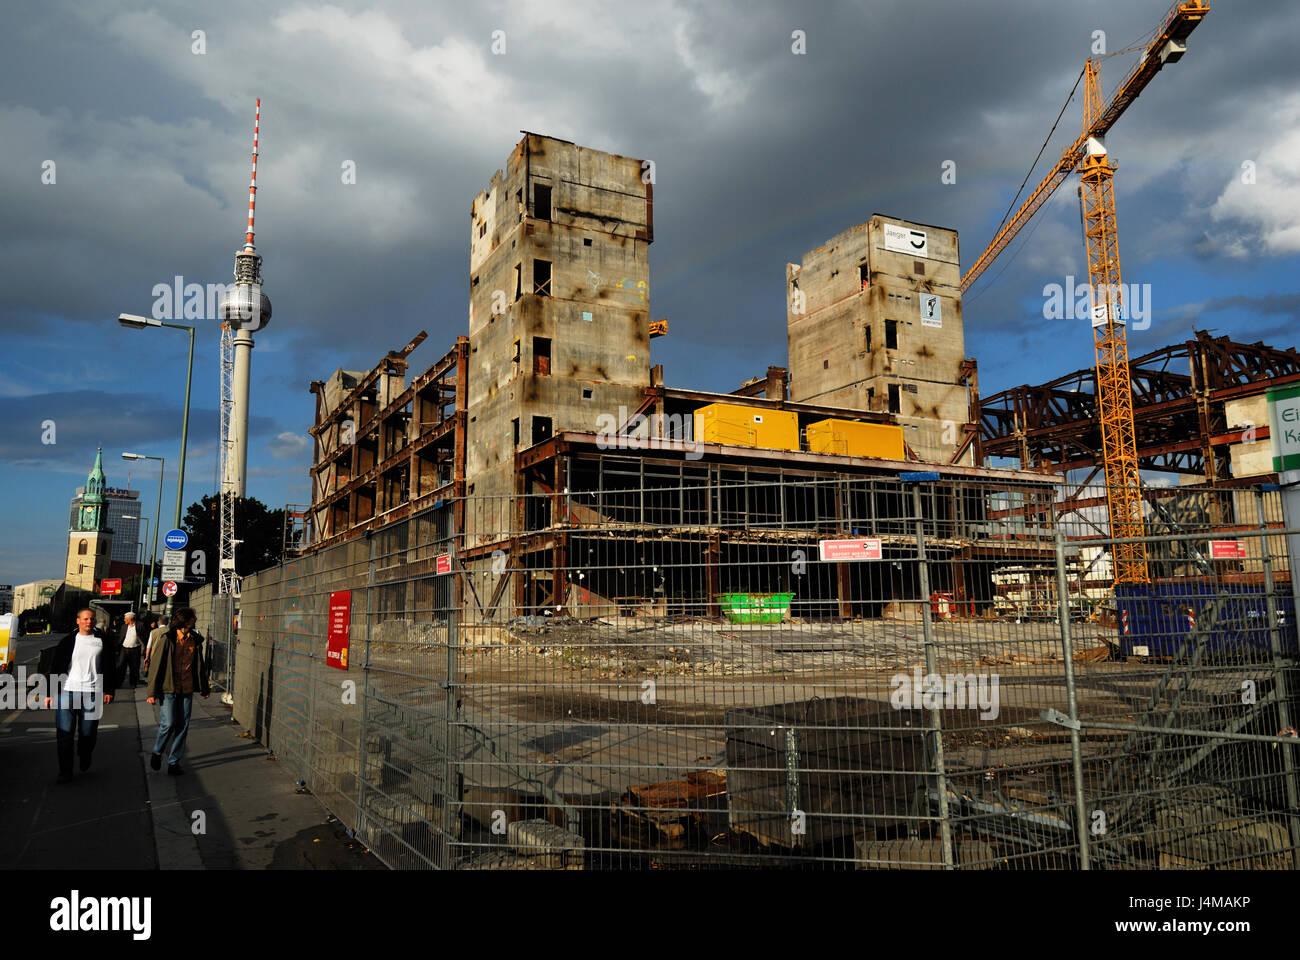 berlin, building, buildings, central, cladding, claddings, constructionPalast der Republik Mitte Palace of the Republic - Stock Image